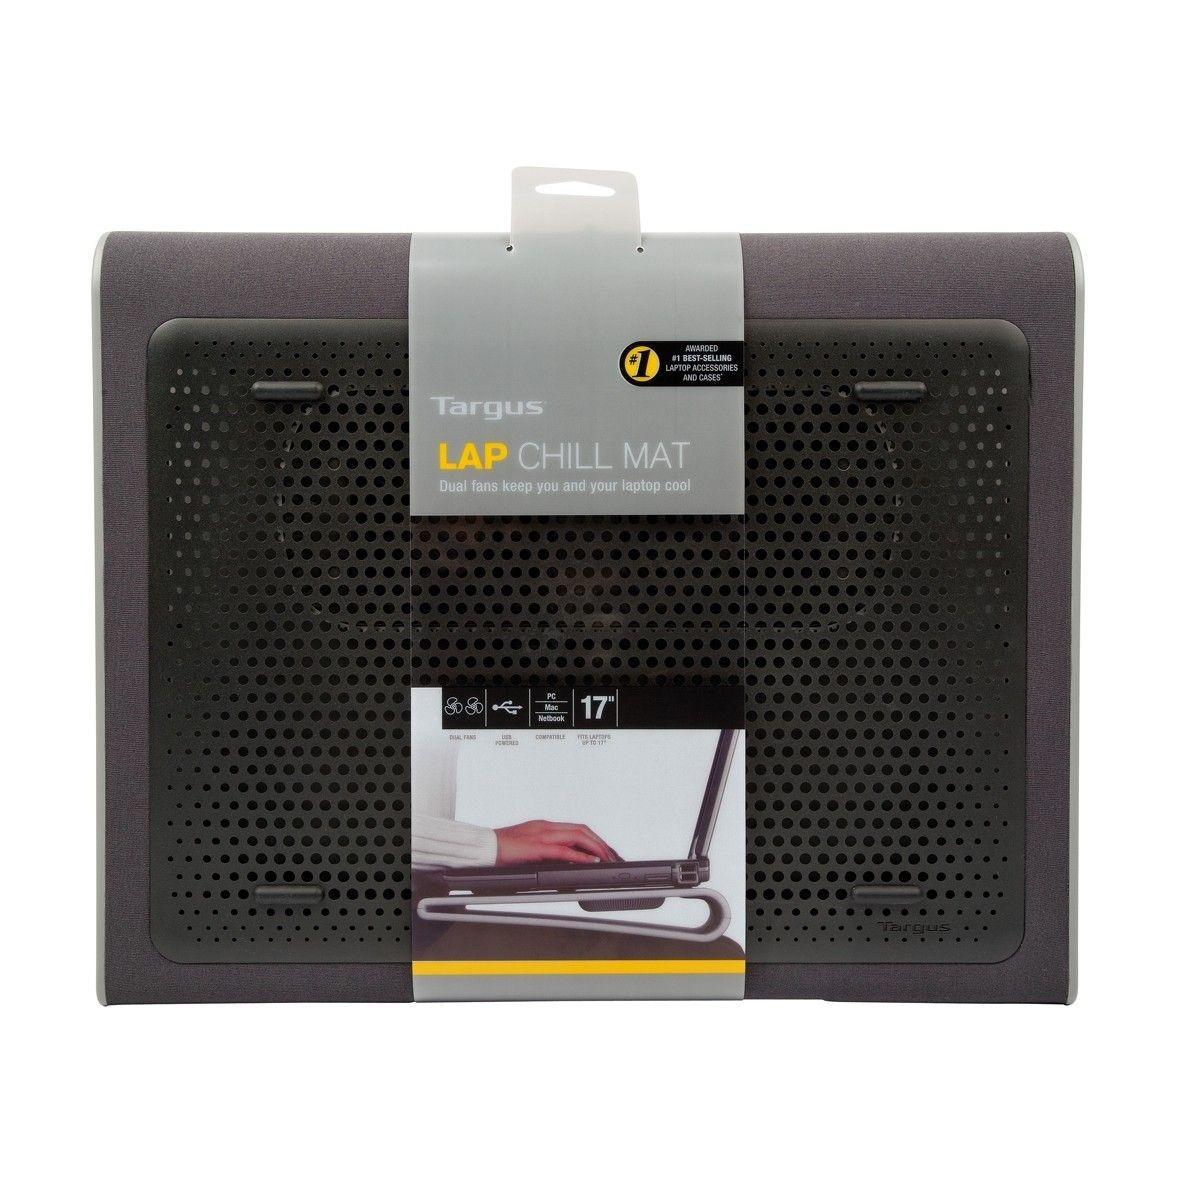 Targus Lap Chill Mat ergonomiczna podstawka chłodząca do notebooka 15.4'' - 17'